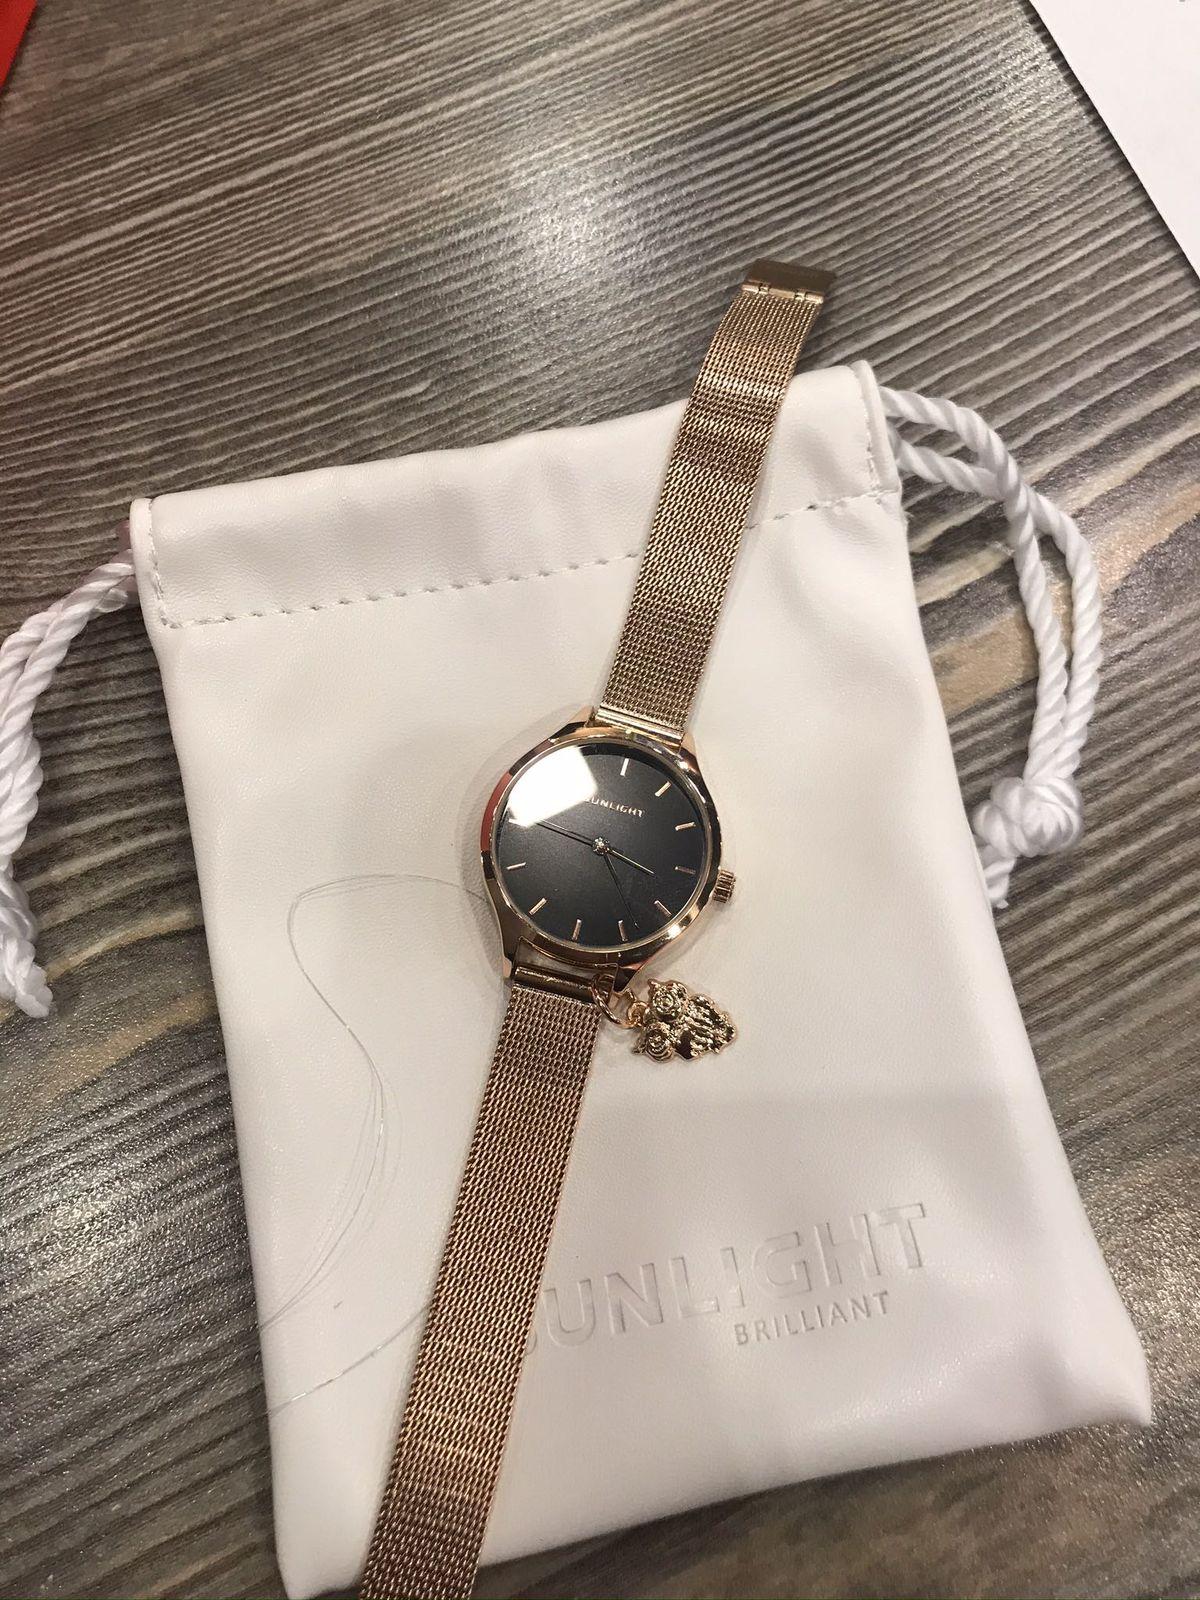 Самые классные часы